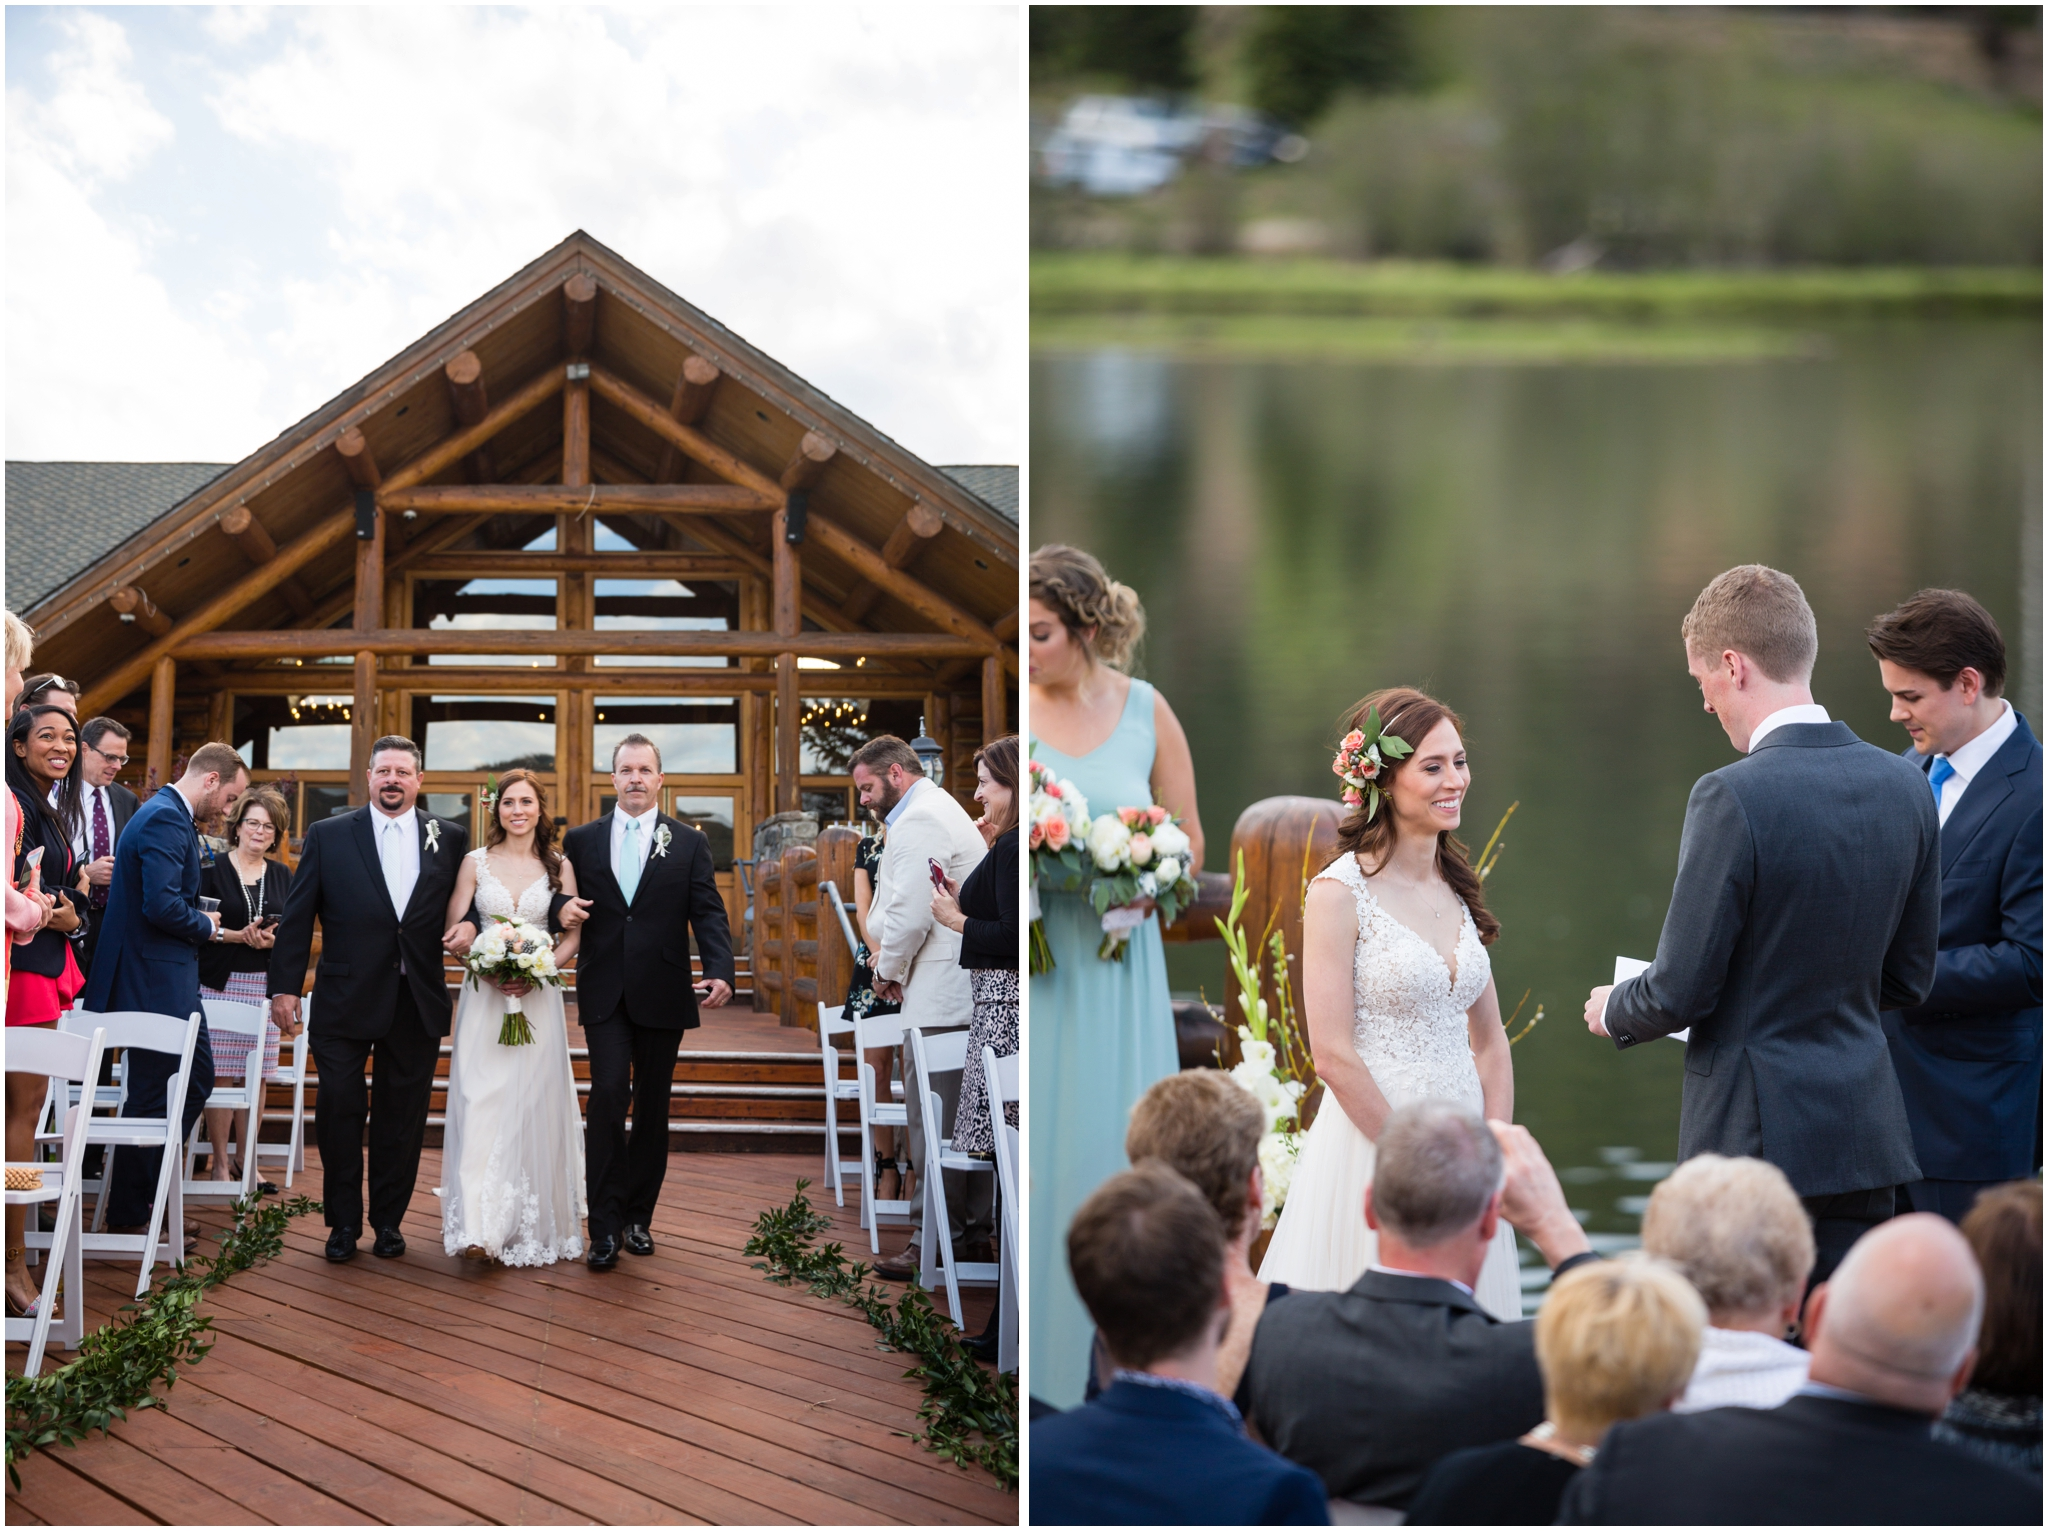 Evergreen_Wedding_Photographer_Bride_Walking_Down_the_aisle.JPG